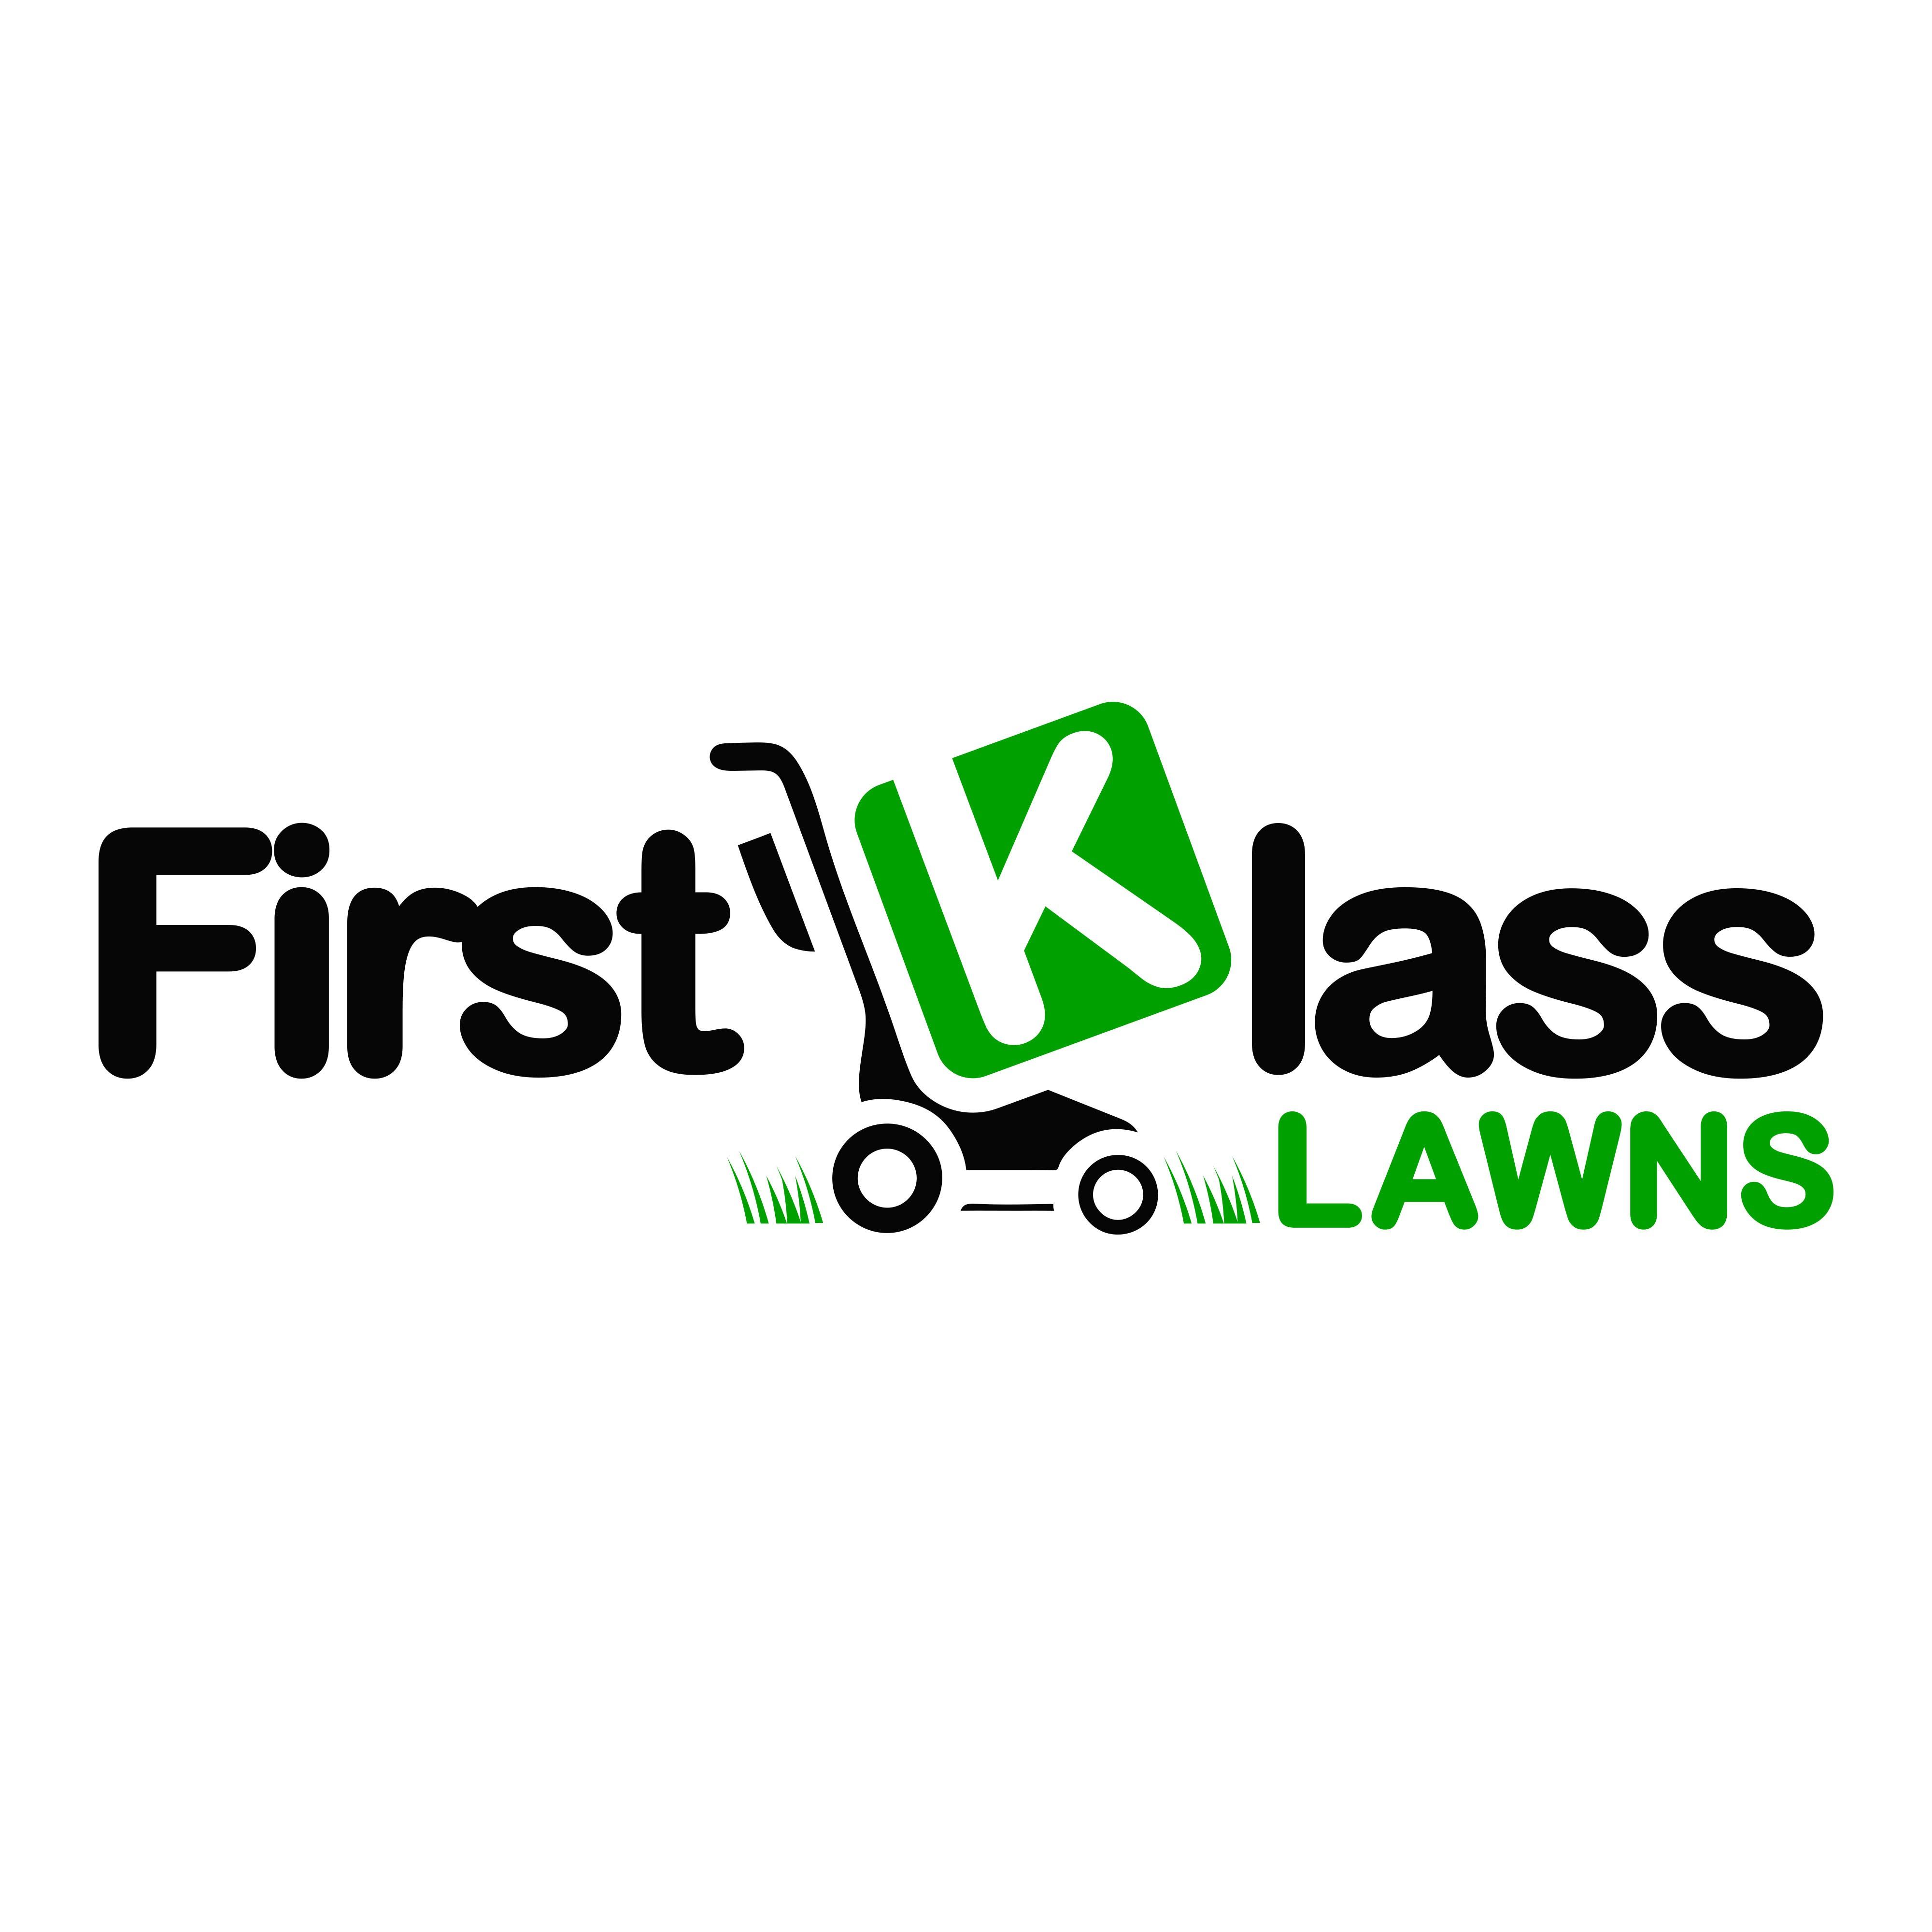 First Klass Lawns - logo needed!